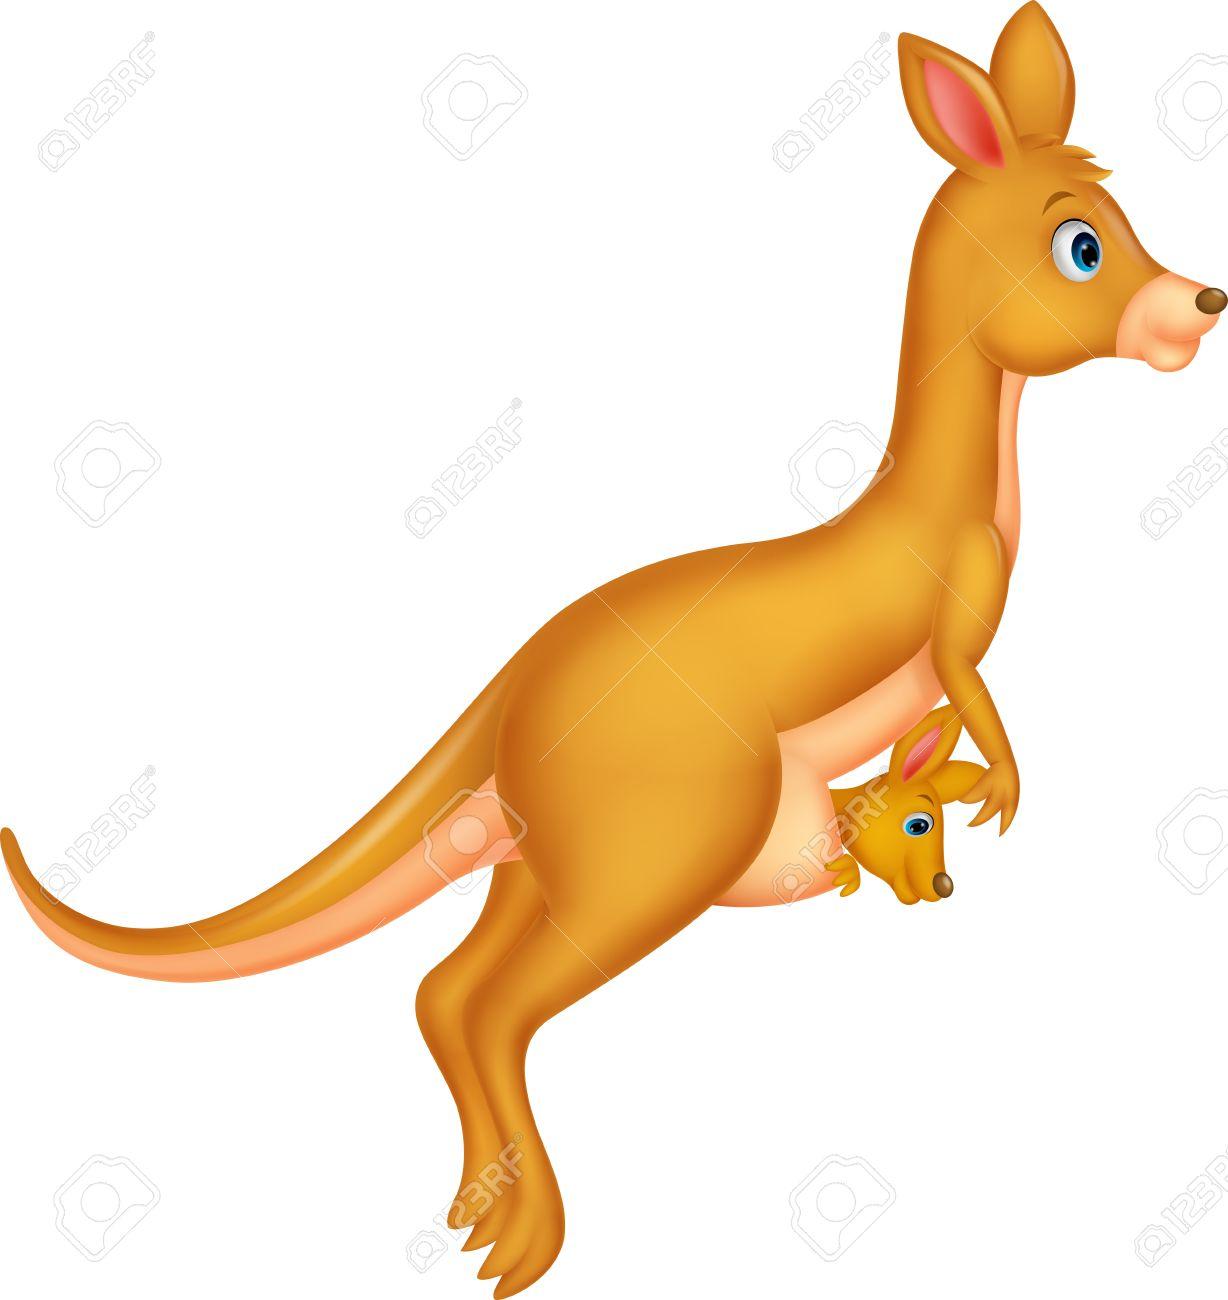 1228x1300 Mother And Baby Kangaroo Cartoon Royalty Free Cliparts, Vectors